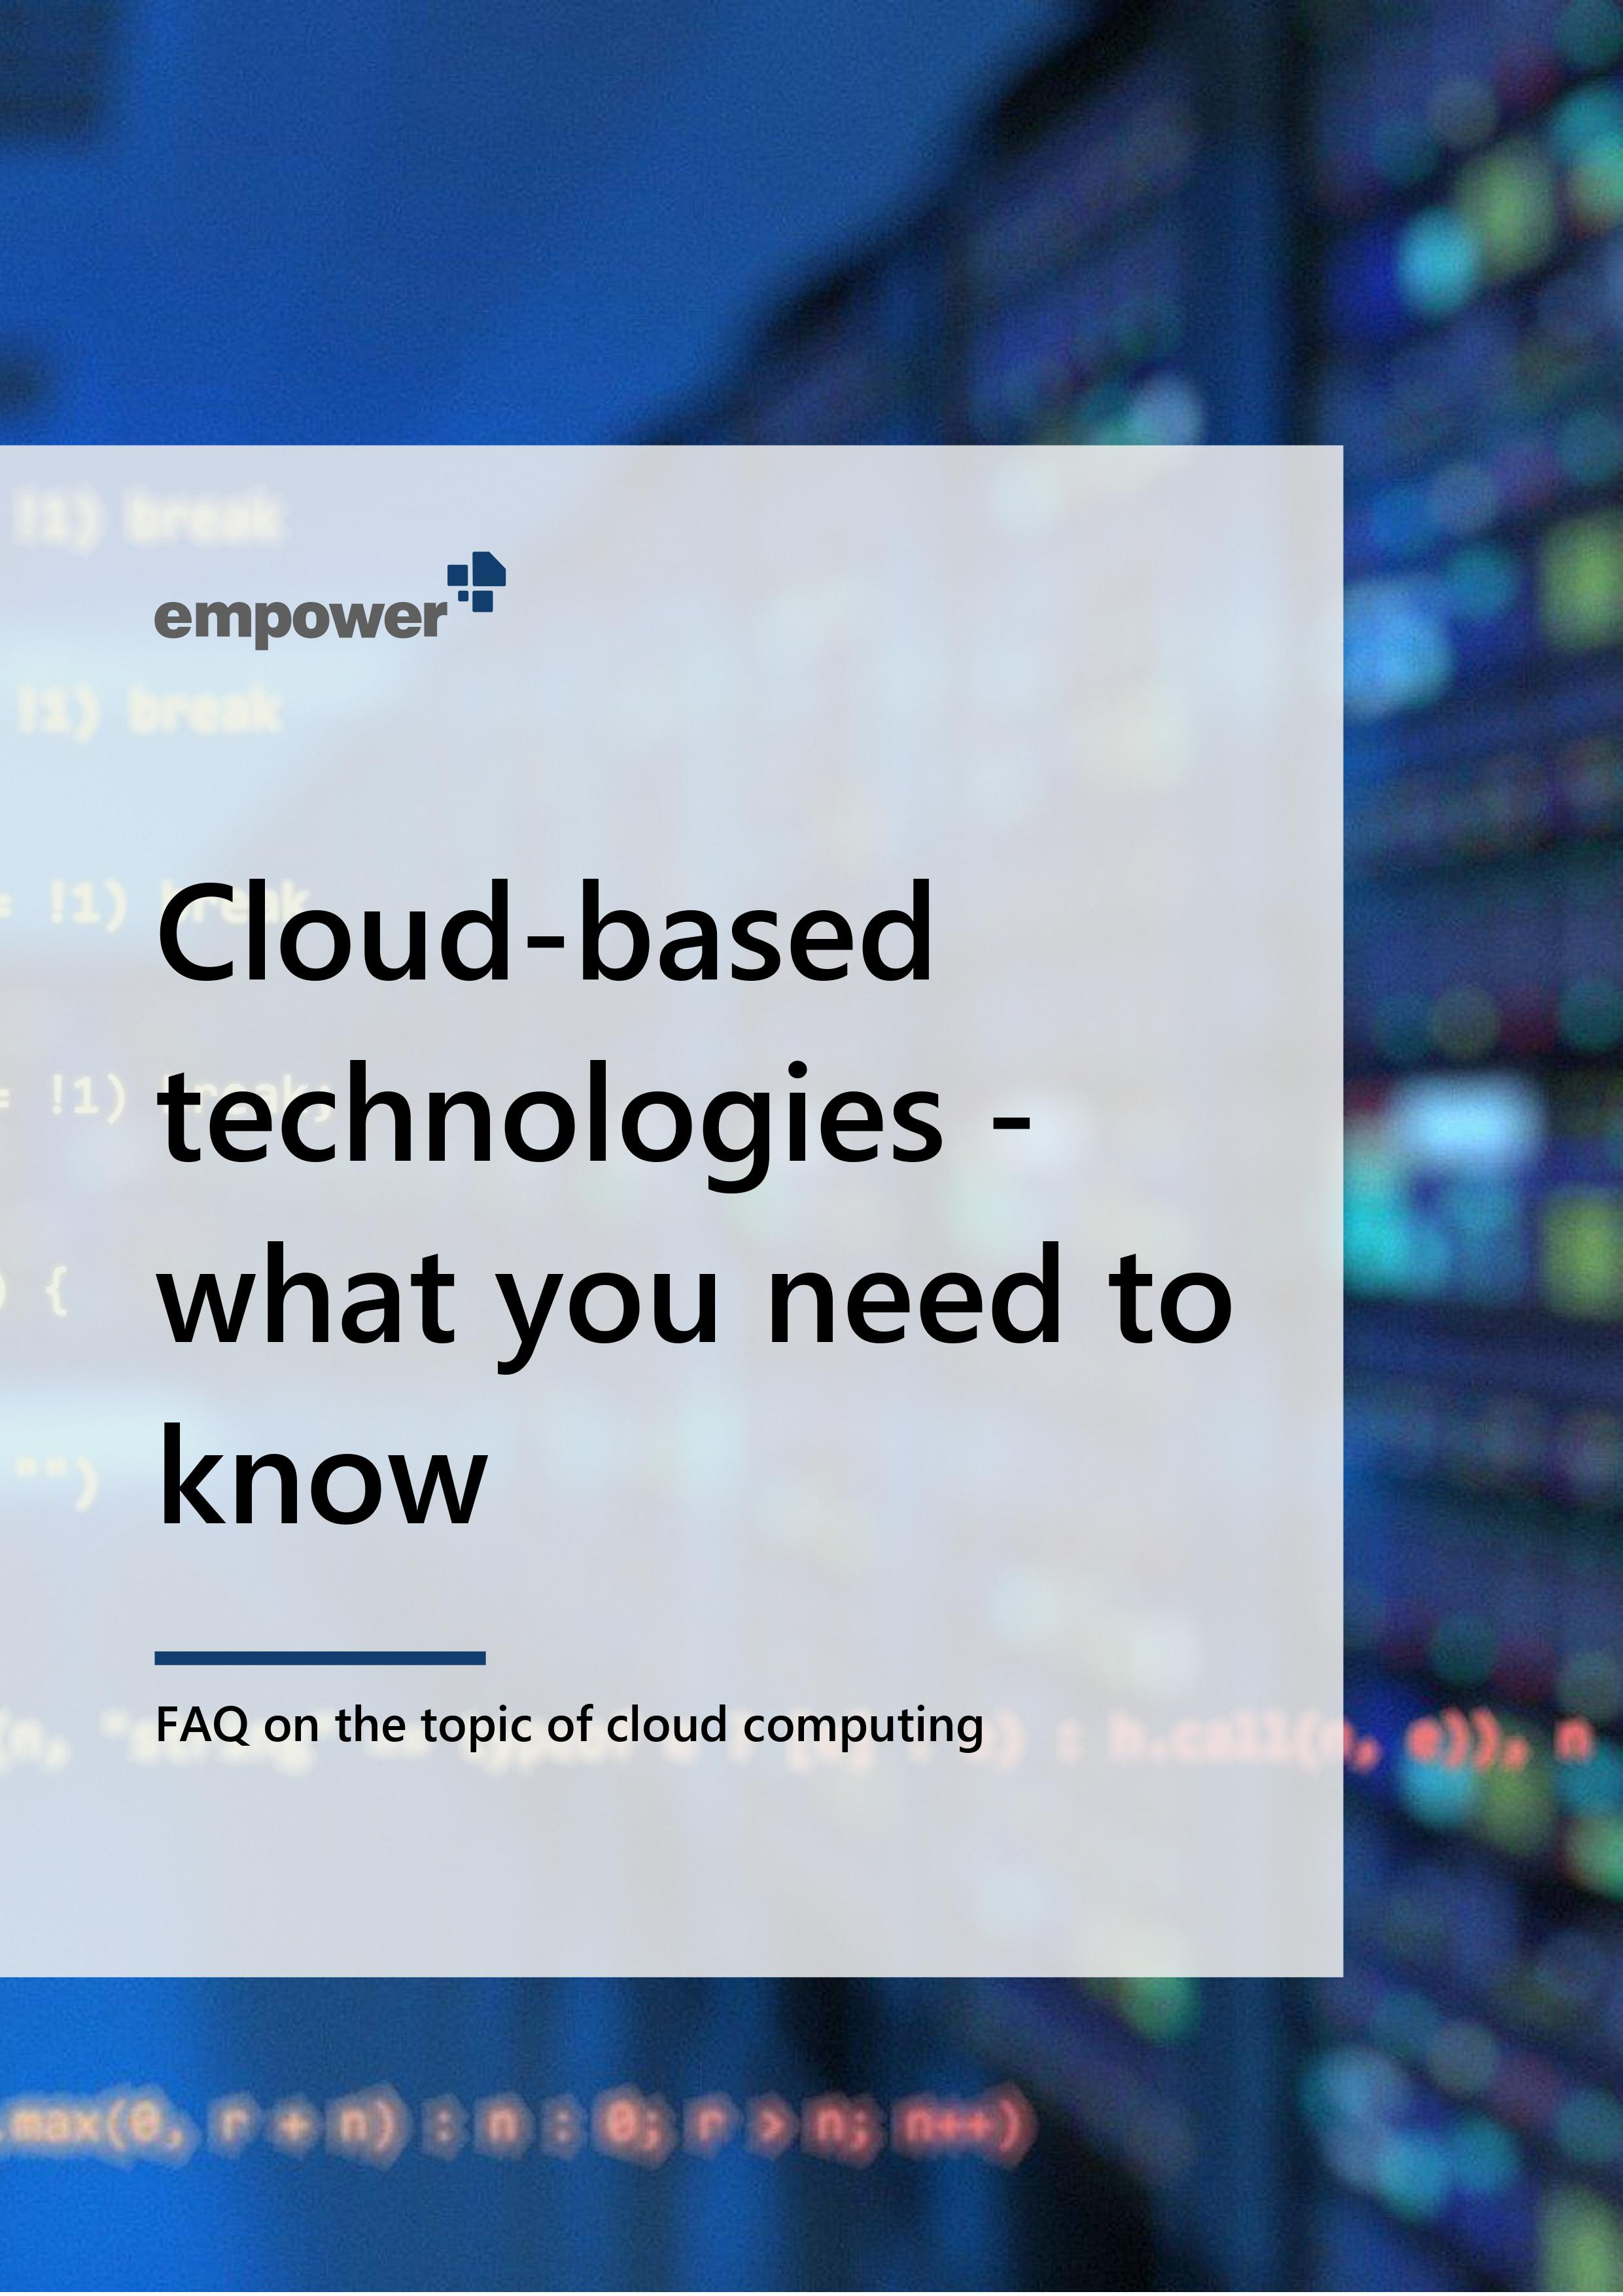 cloud-based technologies